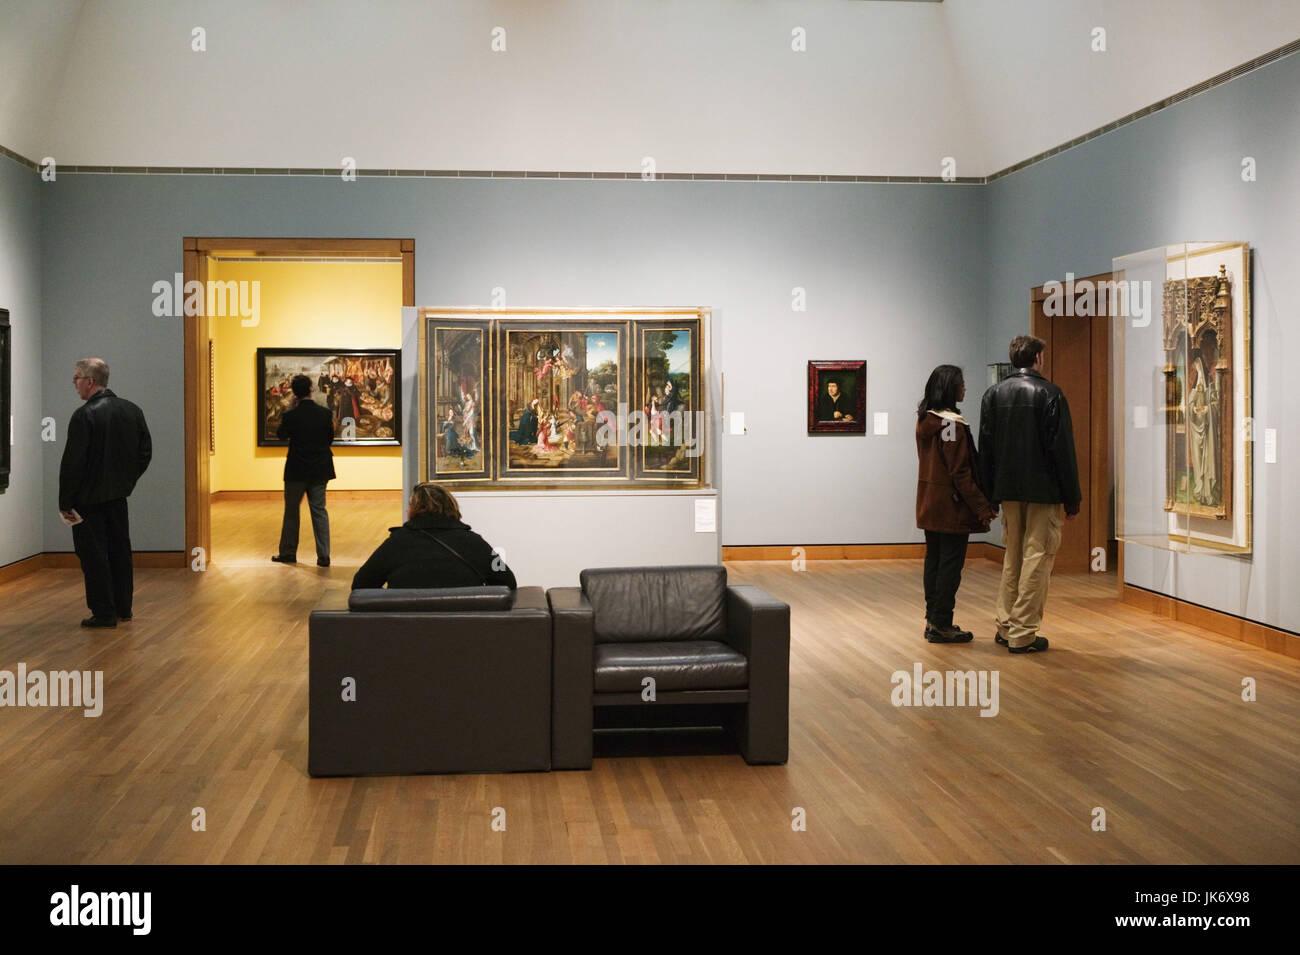 Kanada, Quebec, Montreal, Museum of Fine Art, Ausstellung, Gemälde, Besucher no model release Nordamerika, - Stock Image